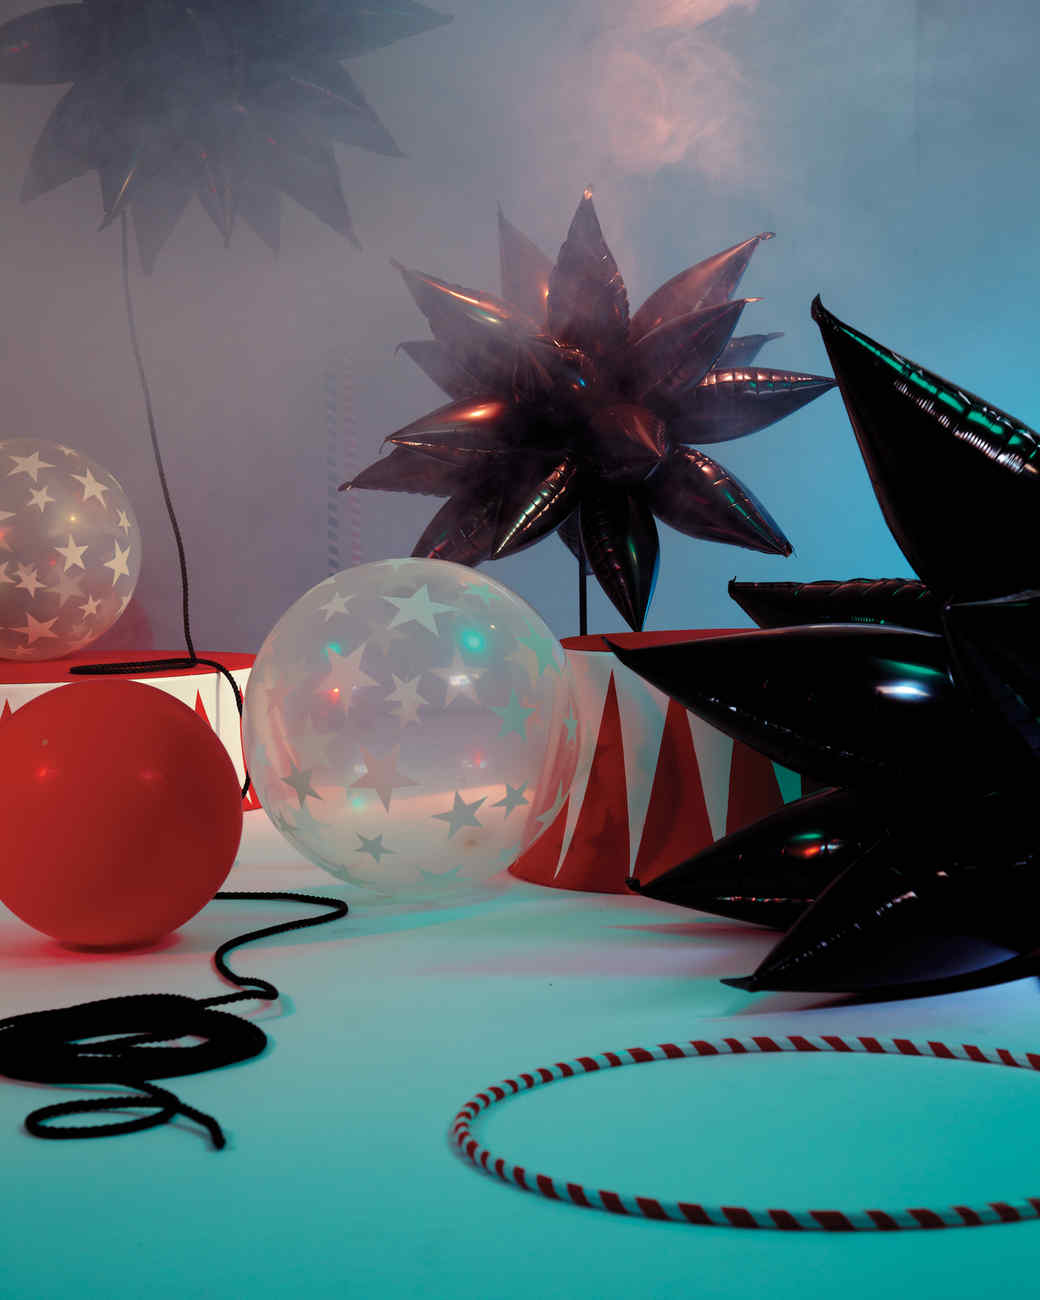 spike-balloon-010-md109073.jpg